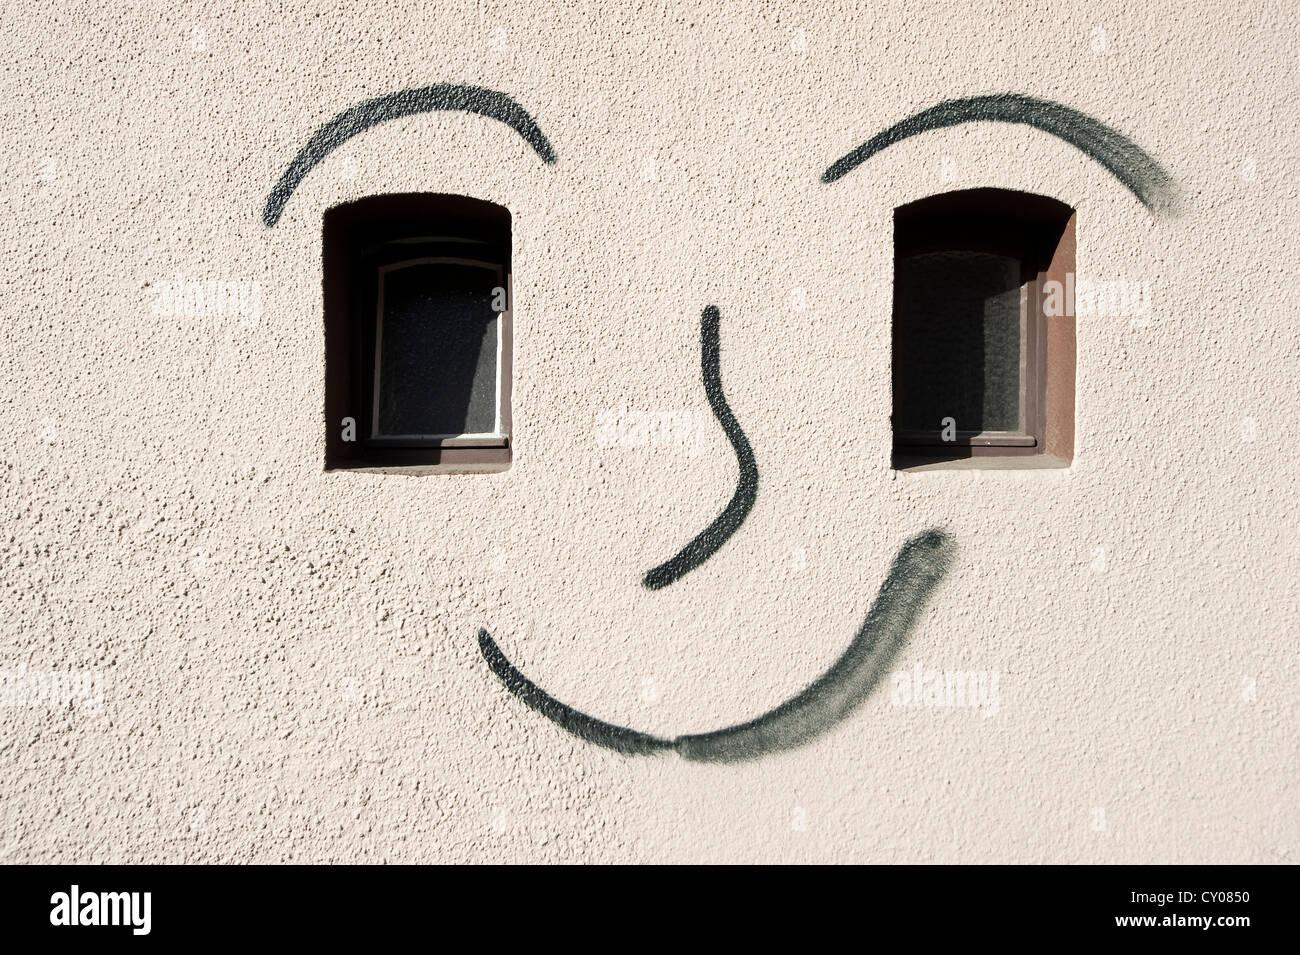 Graffiti, face painted on a facade, Freiburg im Breisgau, Baden-Wuerttemberg - Stock Image